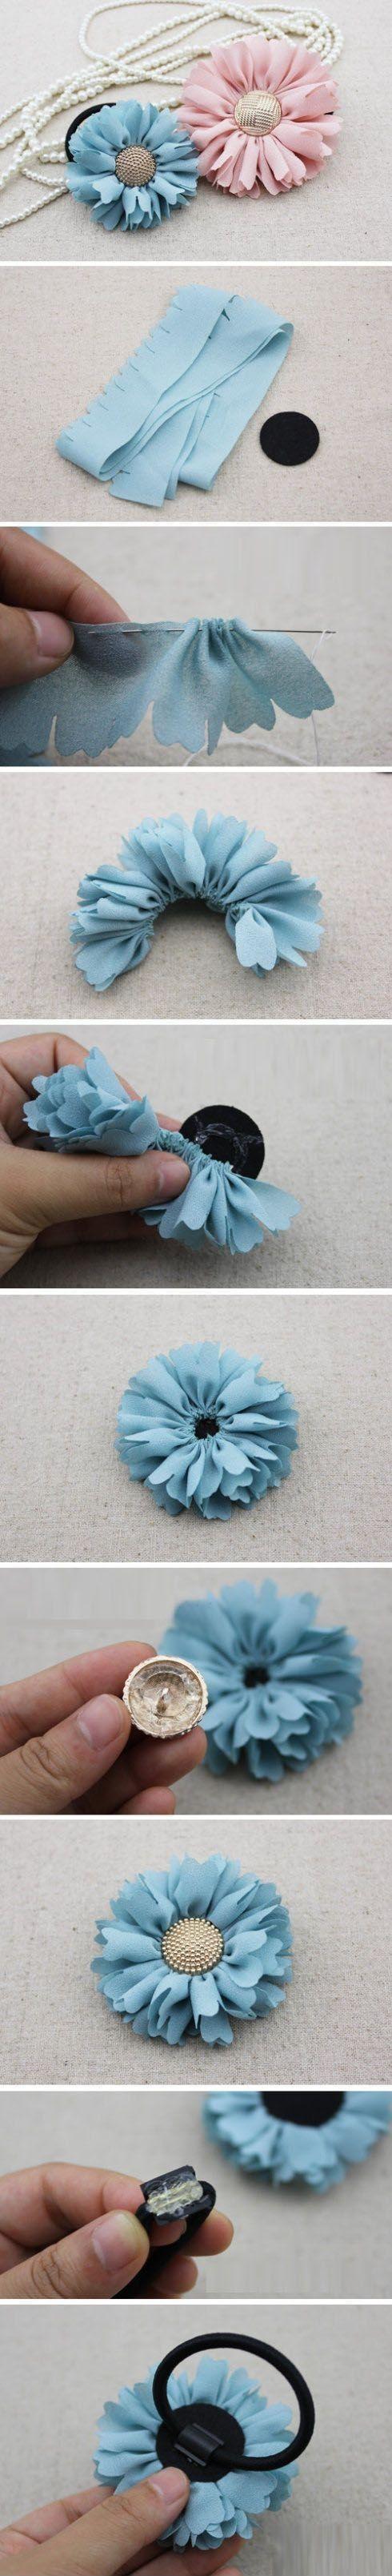 fabriquer elastique cheveux tuto diy